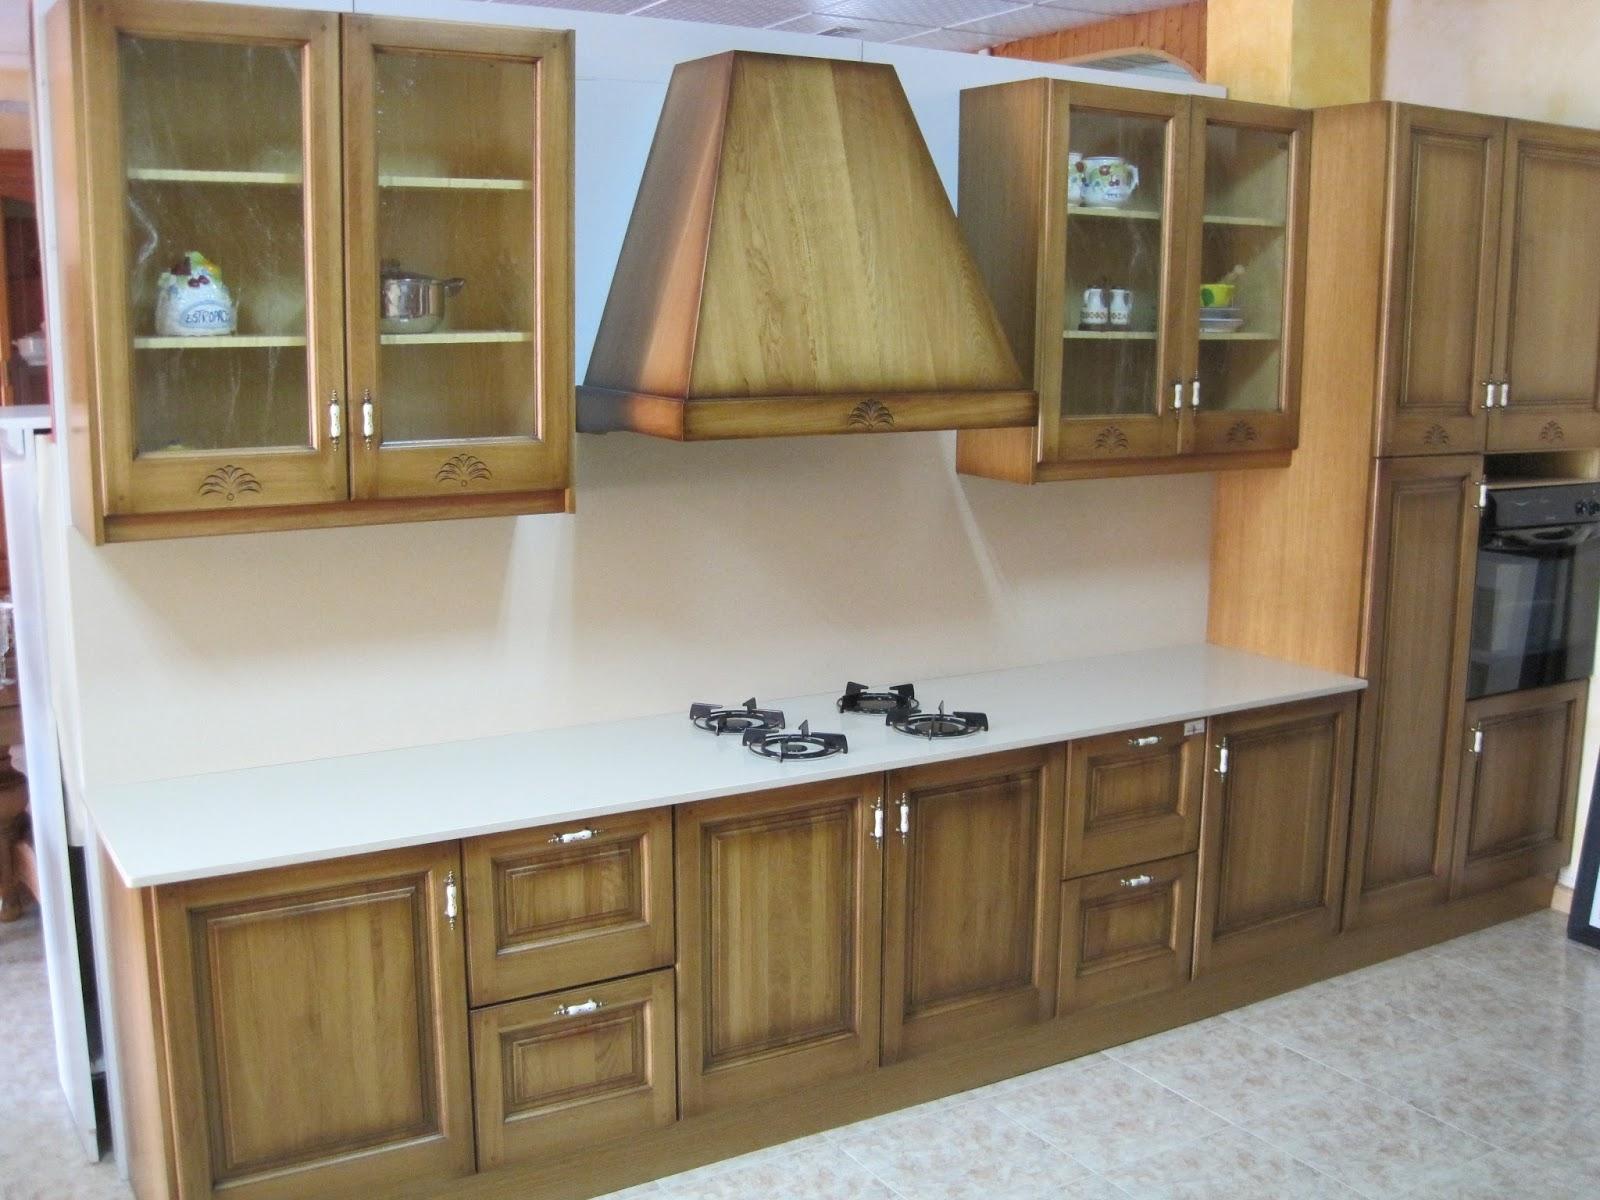 Muebles arcecoll cocina de roble - Cocinas de madera de roble ...